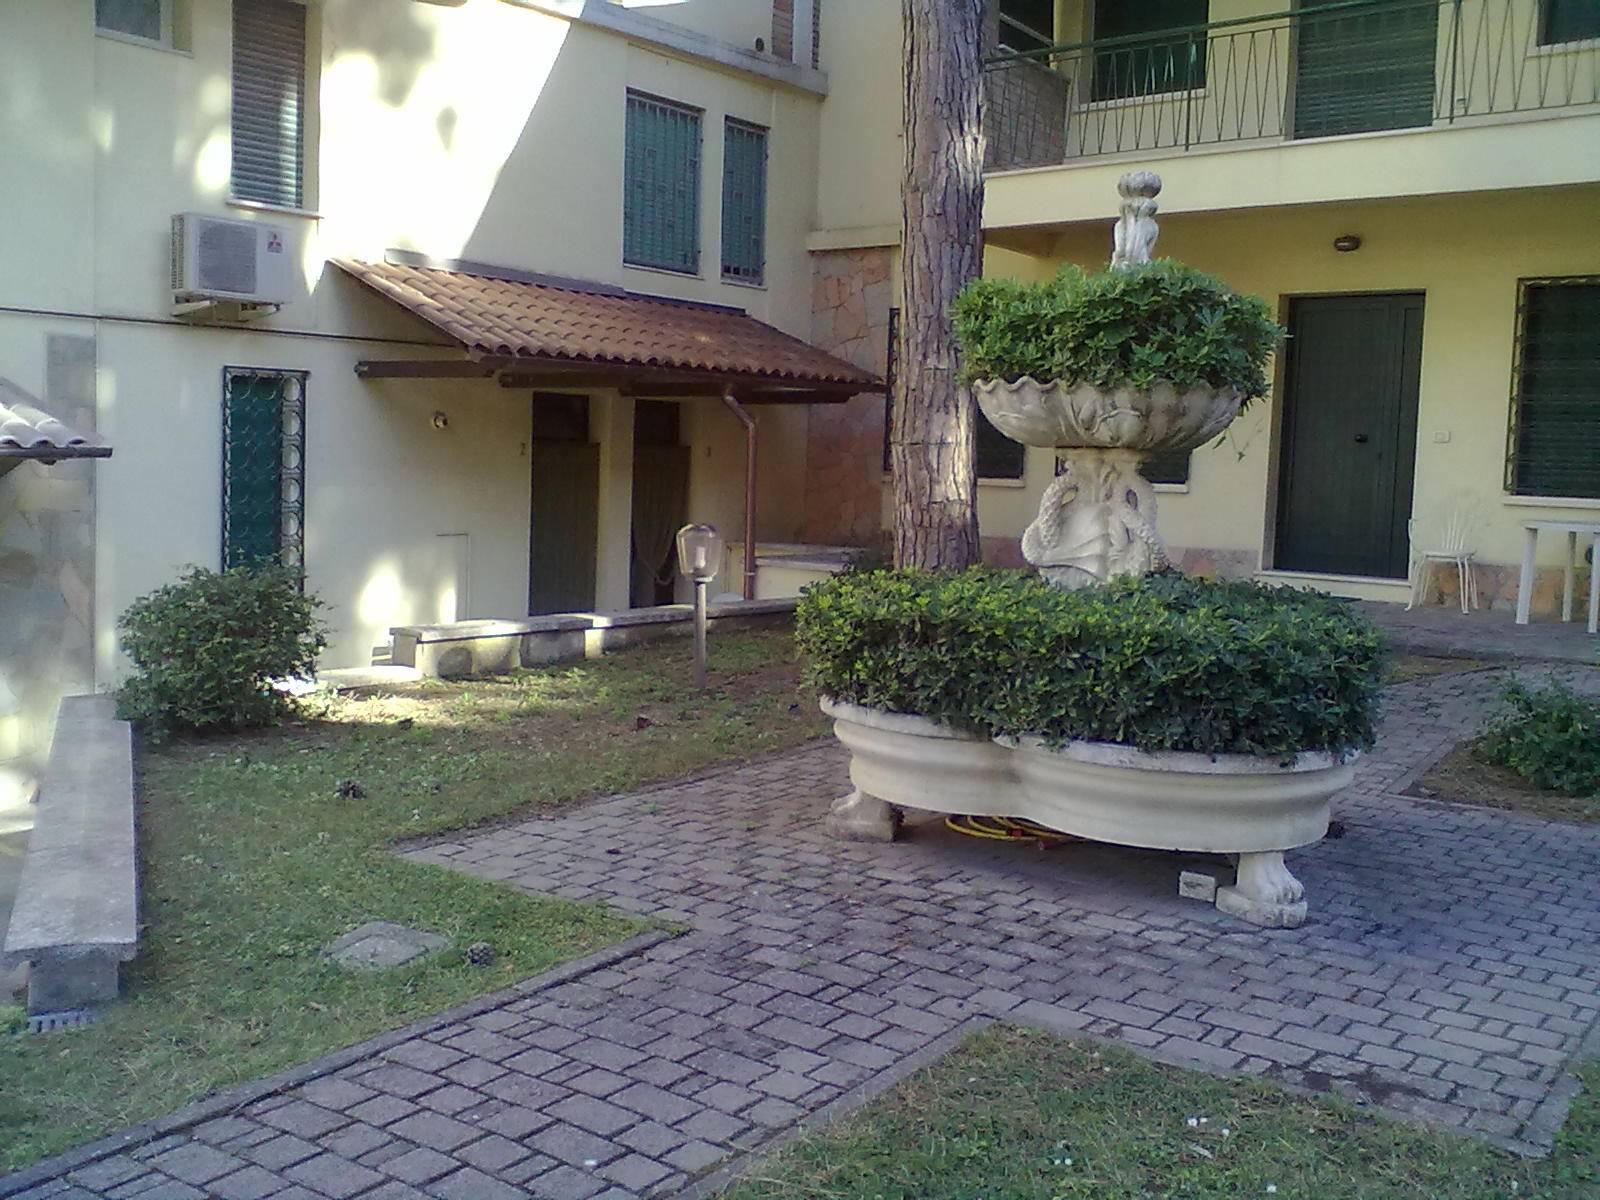 Appartamento indipendente a COMACCHIO